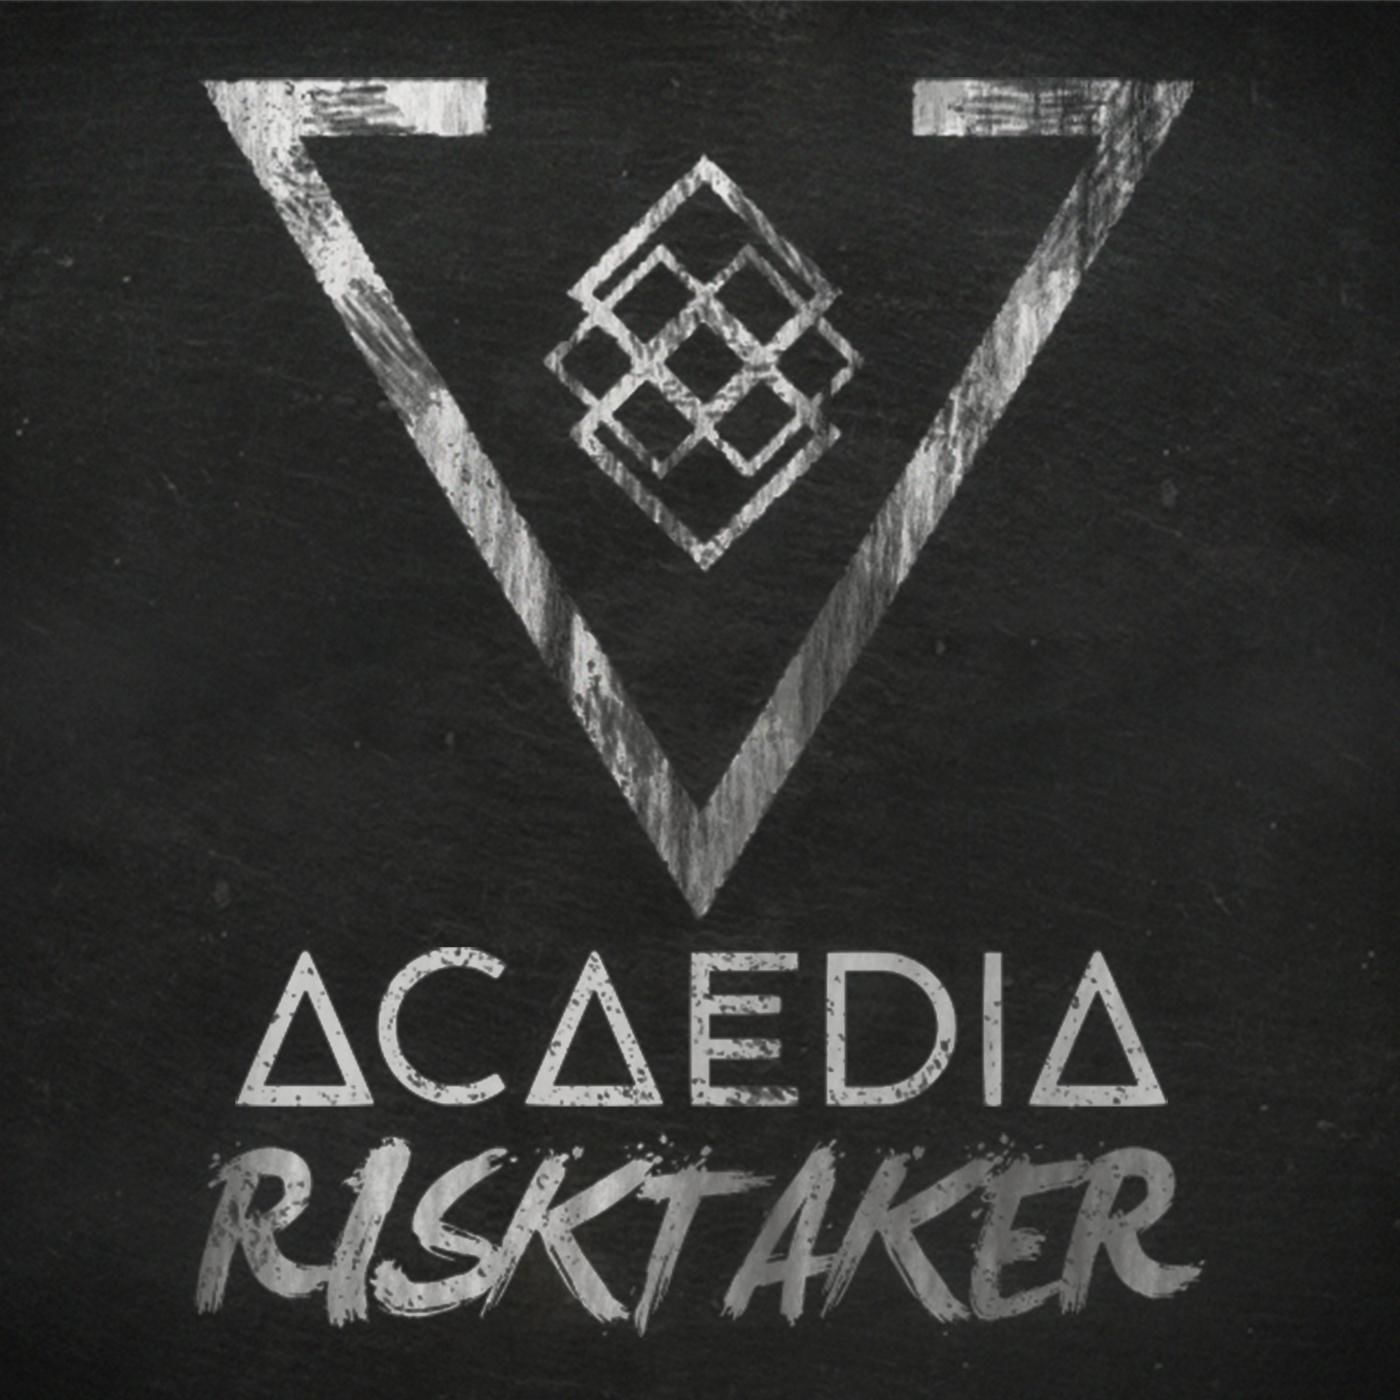 Acaedia - Risktaker [single] (2016)